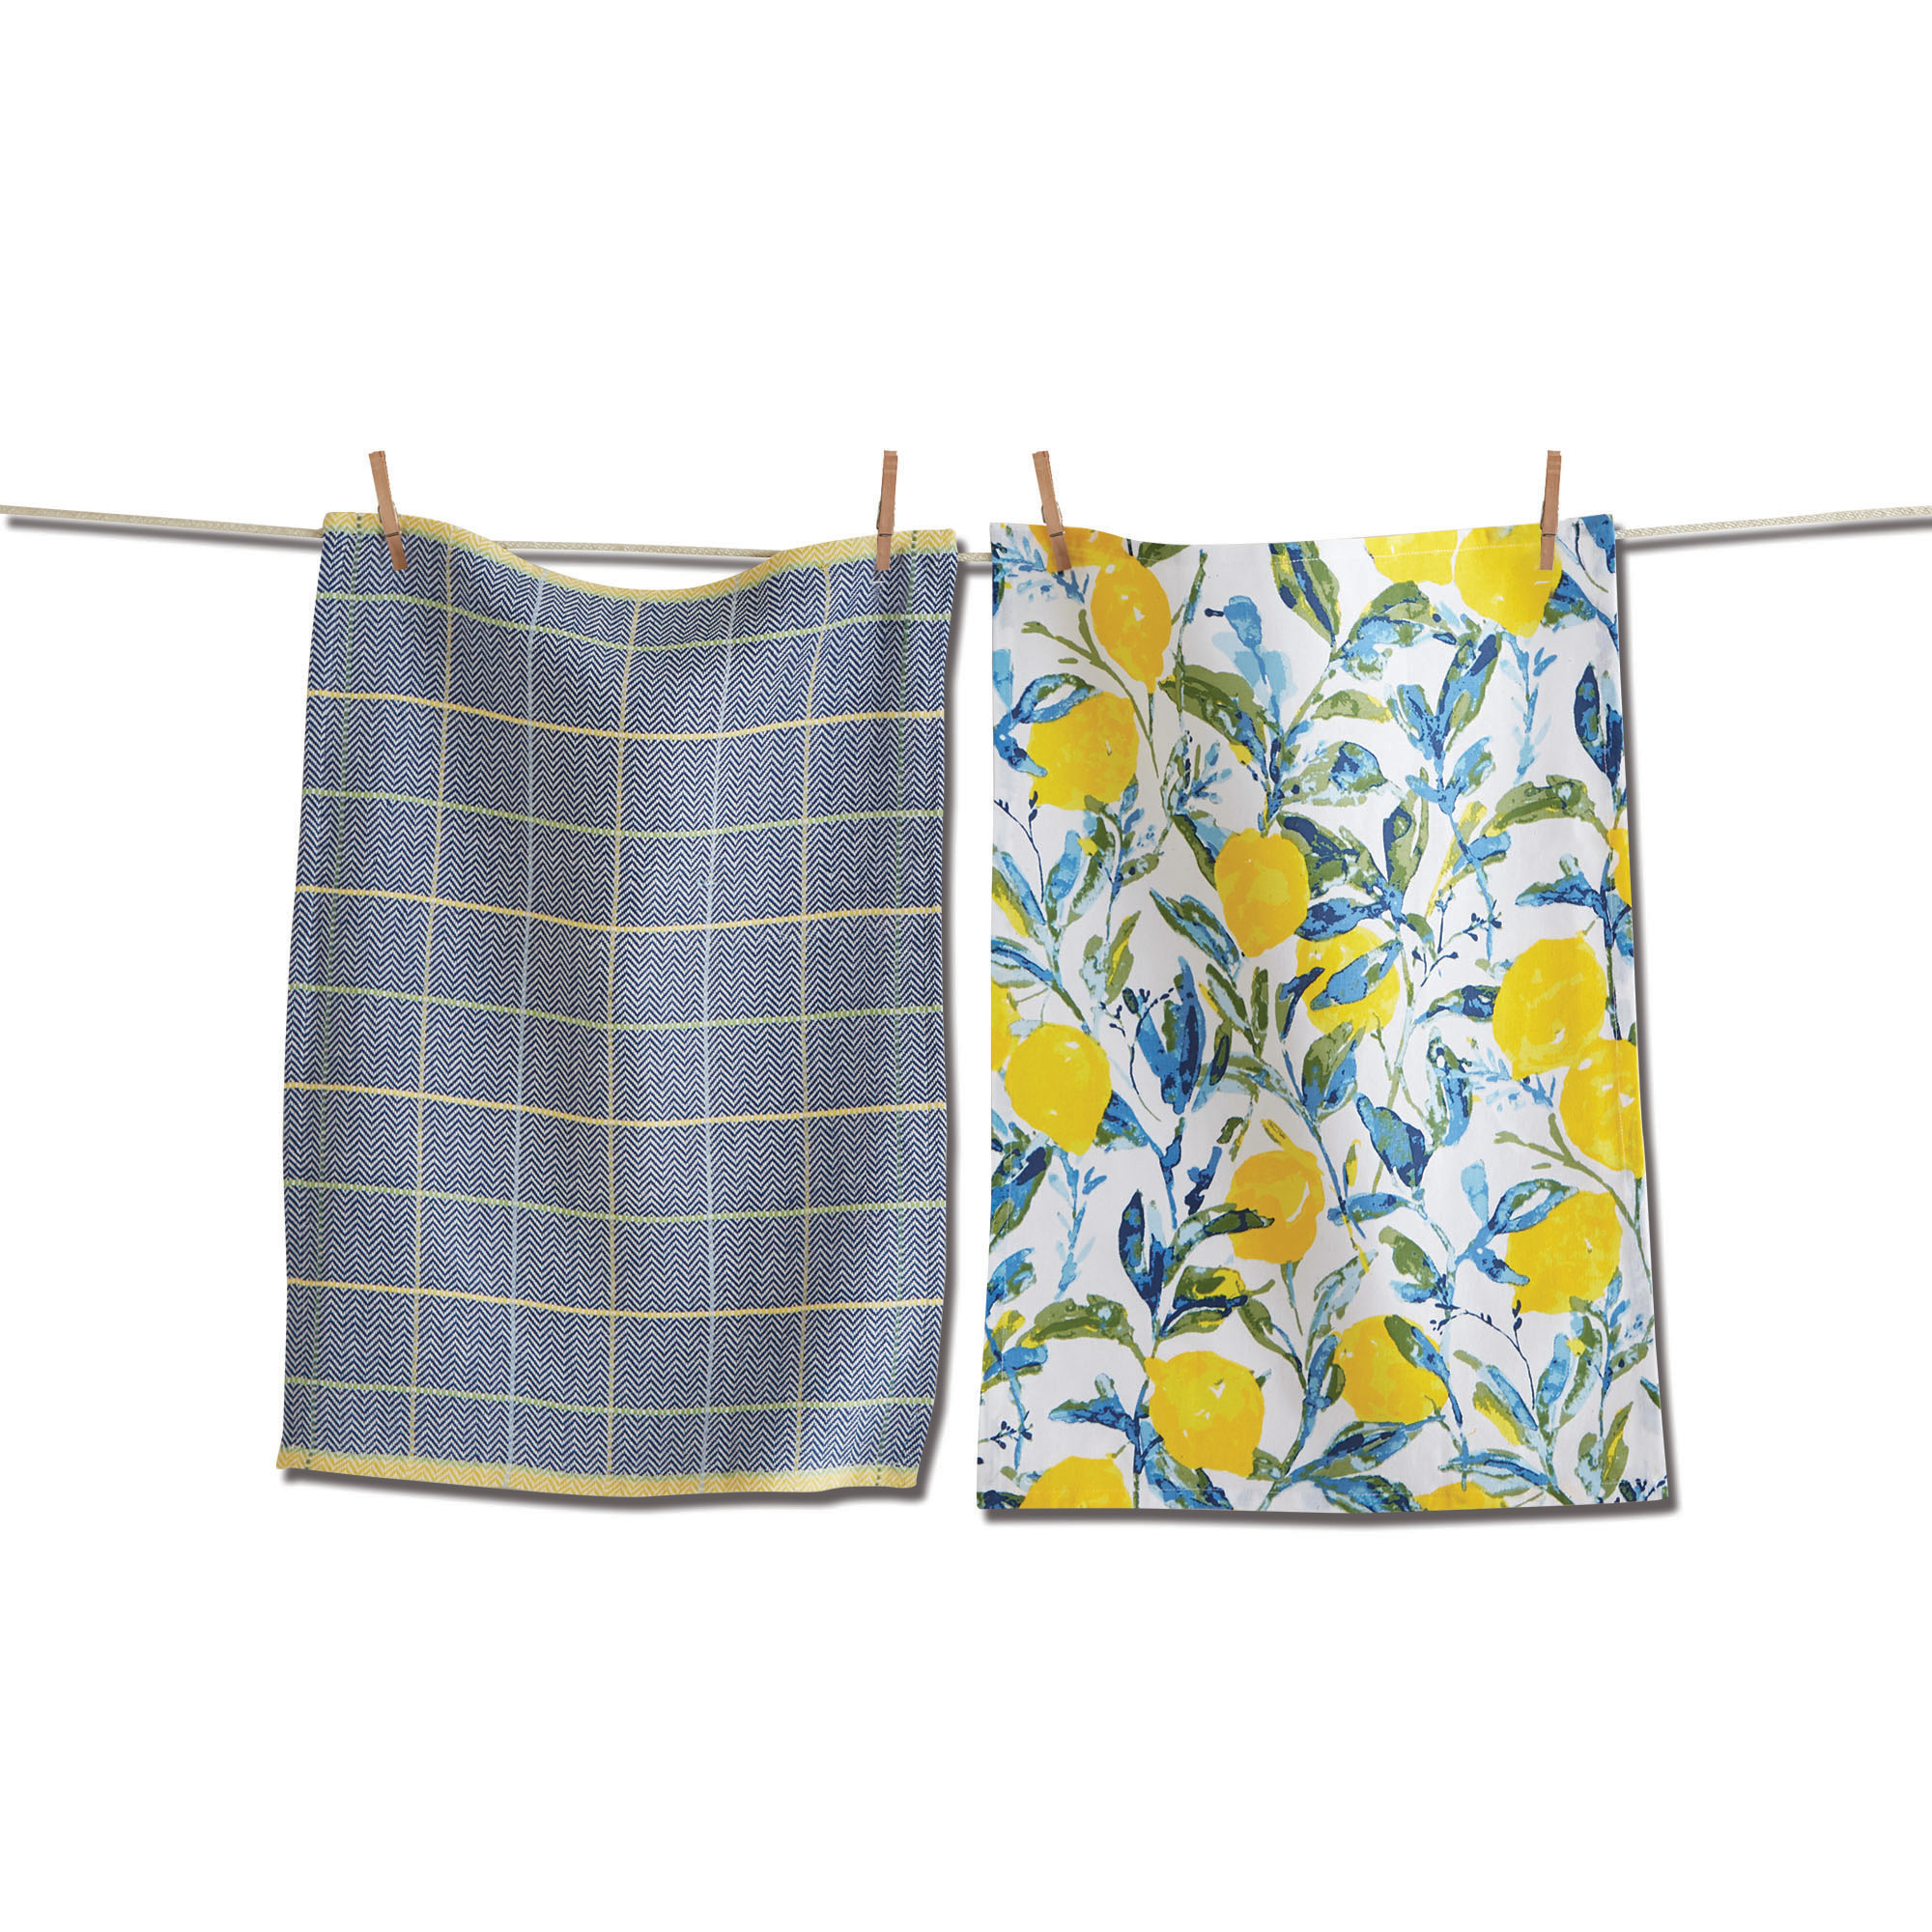 Tag Dish Towel - Lemon Grove - Set of 2